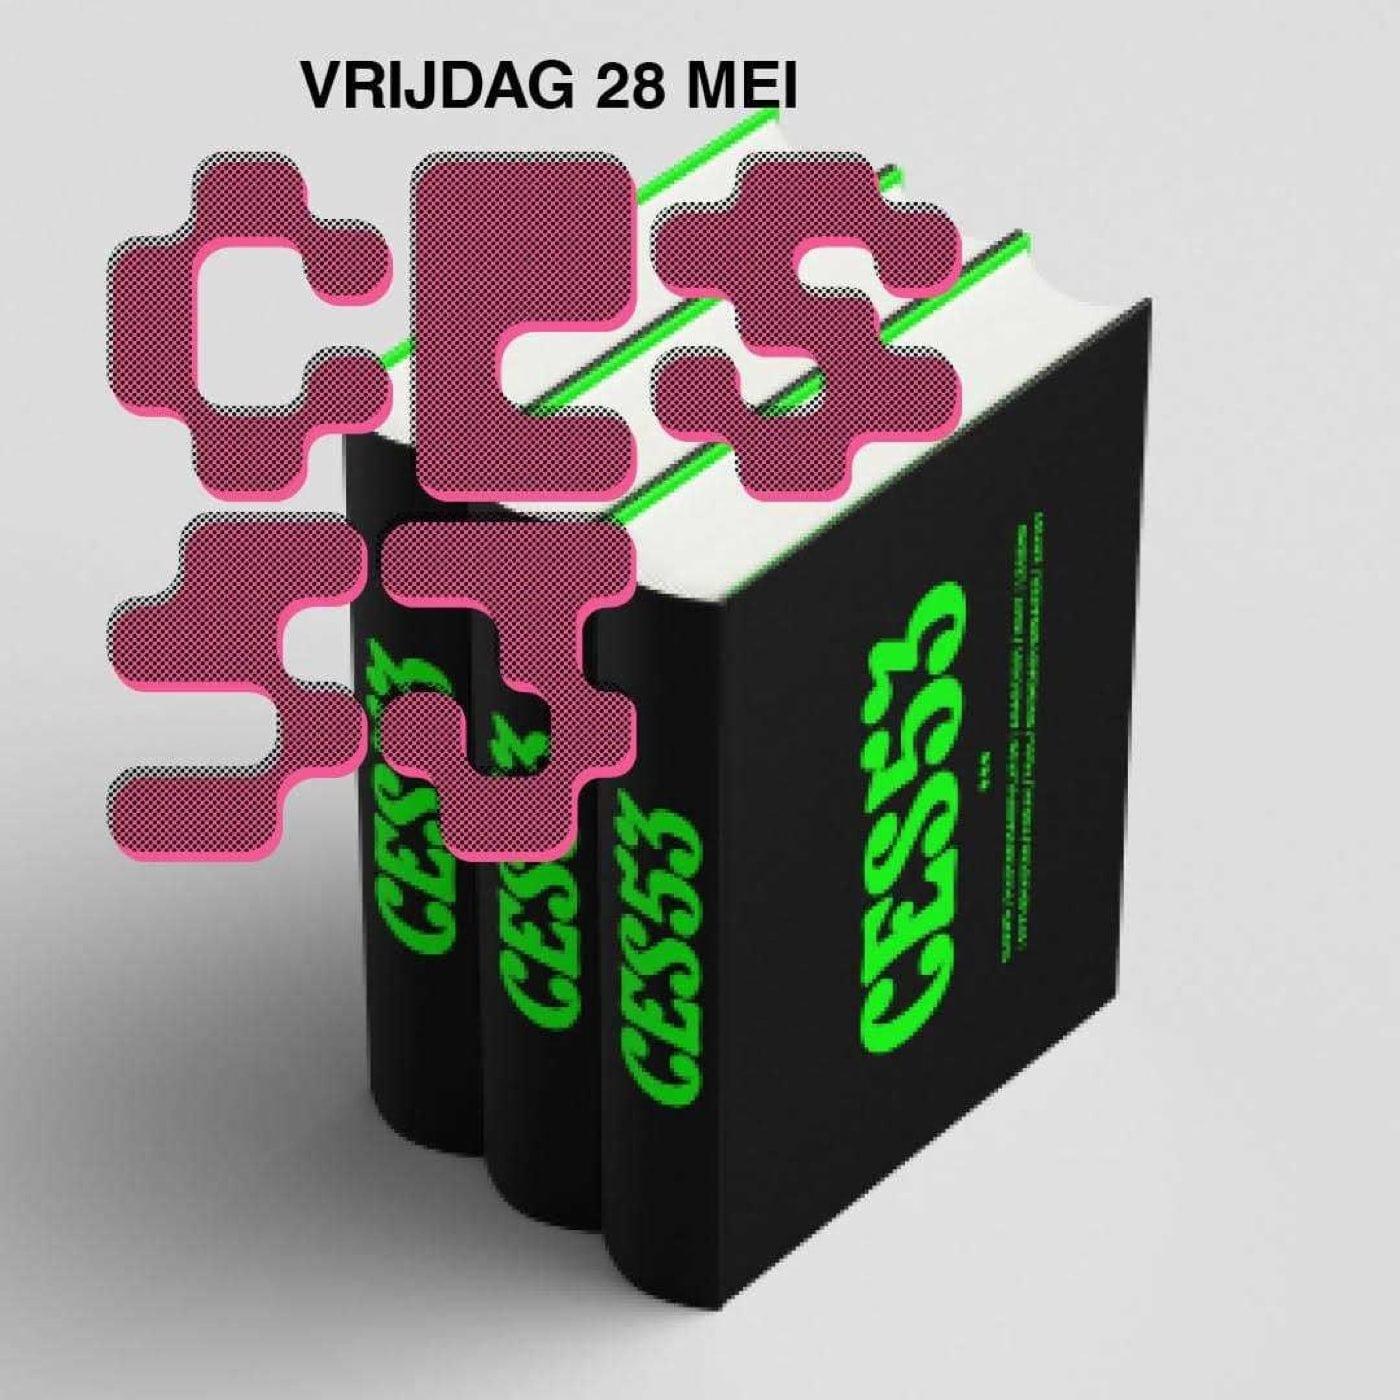 Kladmuur - Ces53